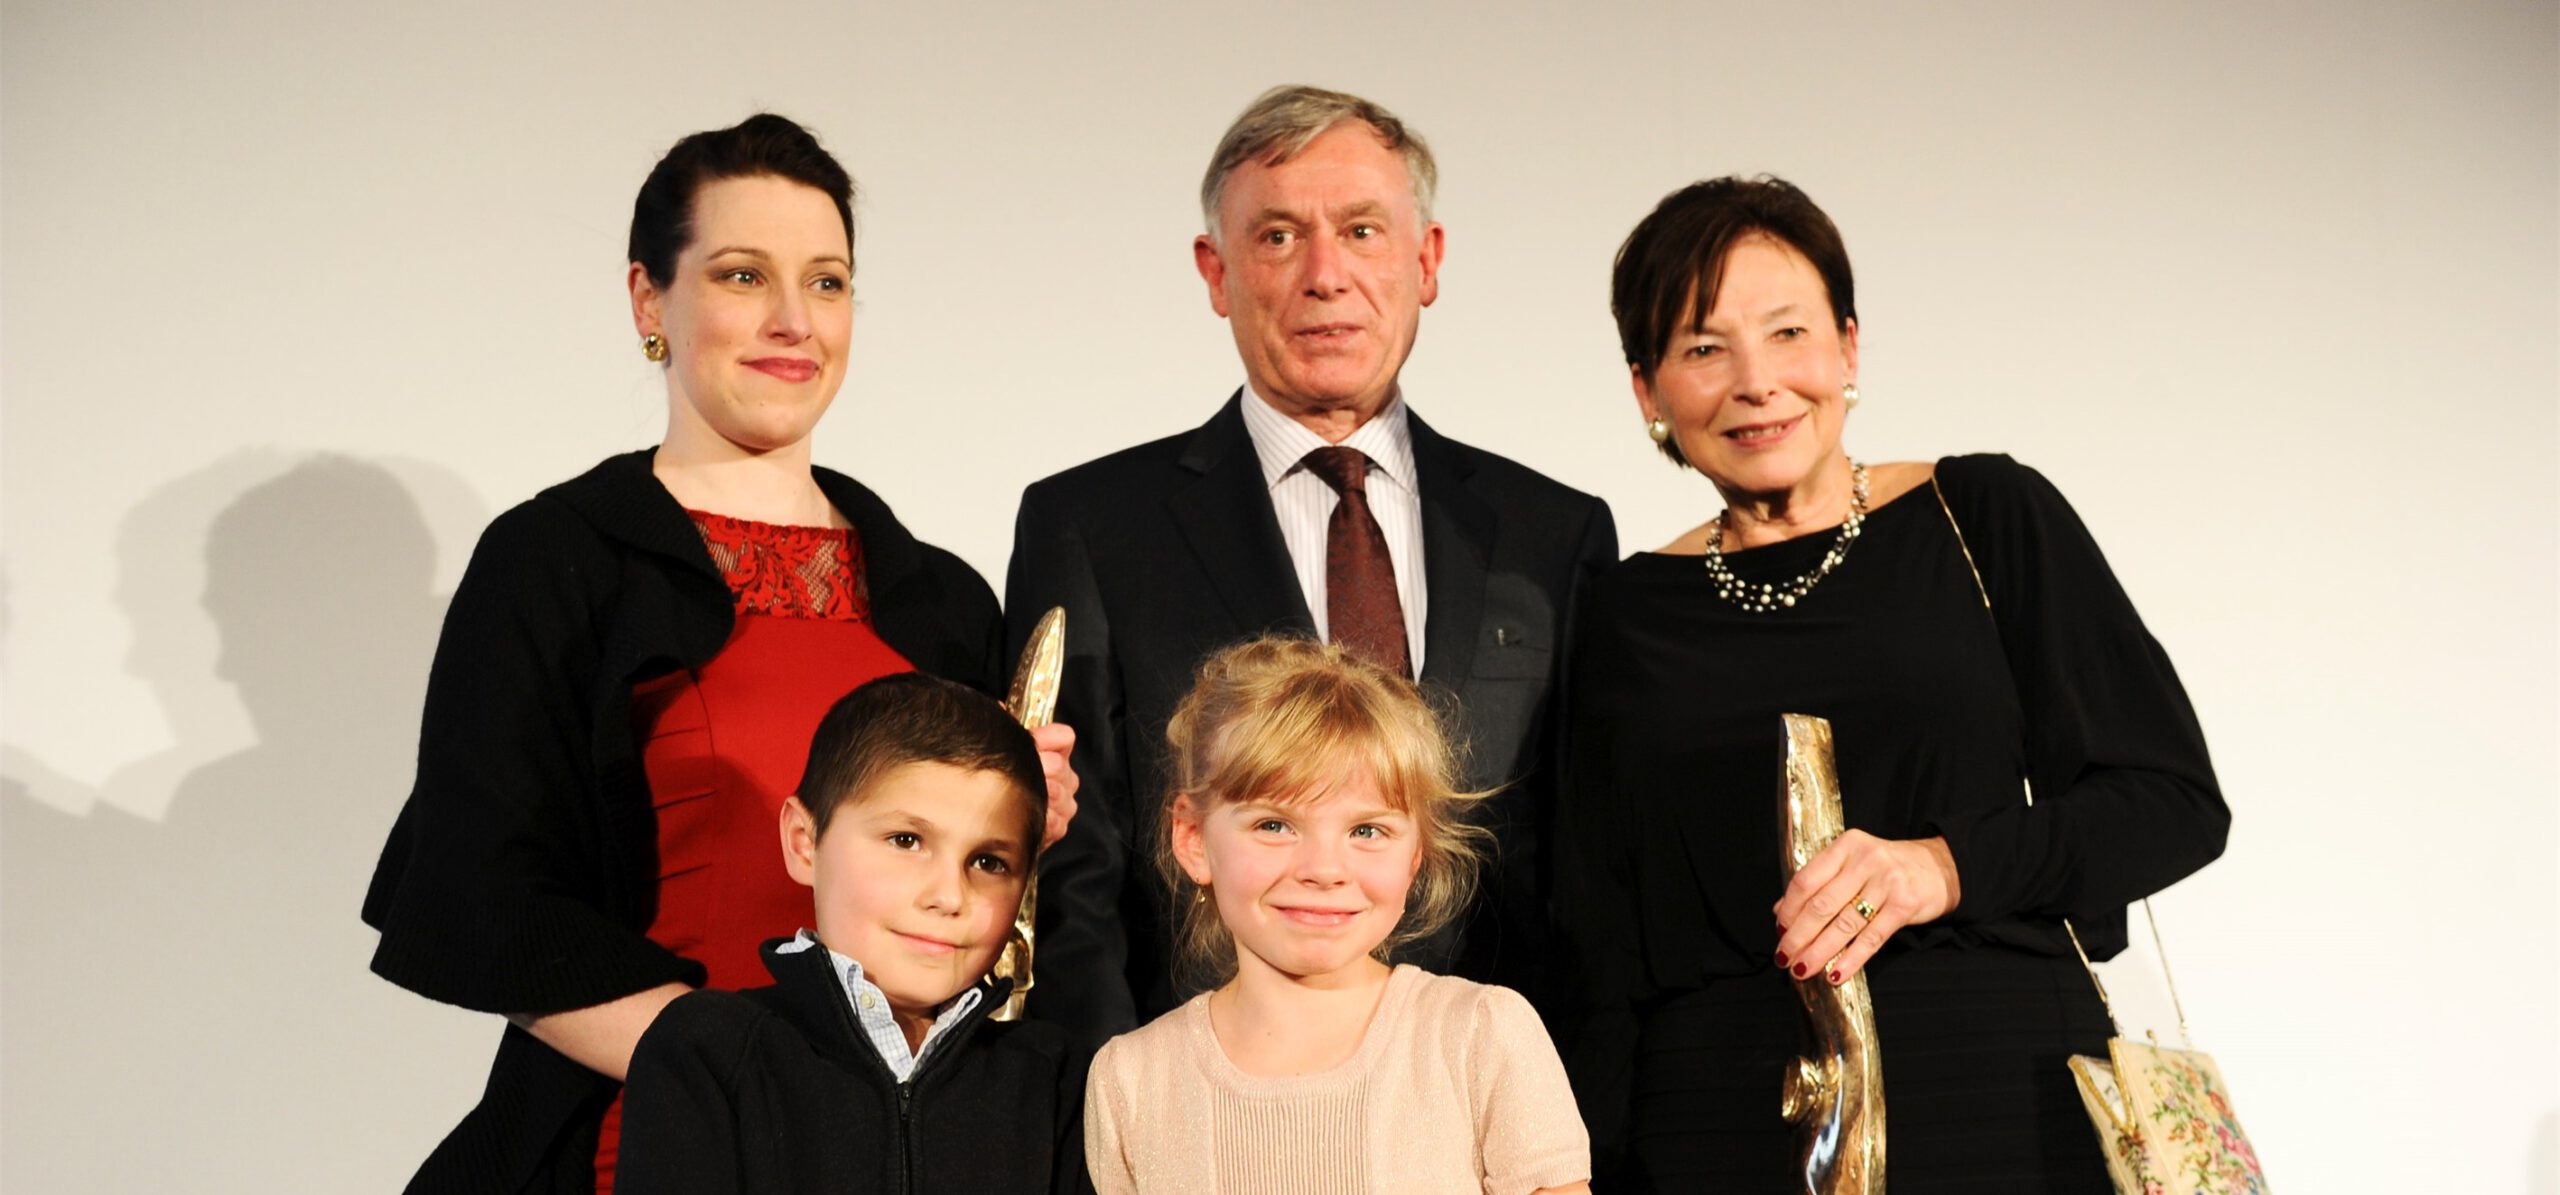 Pro.movere 2013: Festliche Preisverleihung im Schloss Nymphenburg